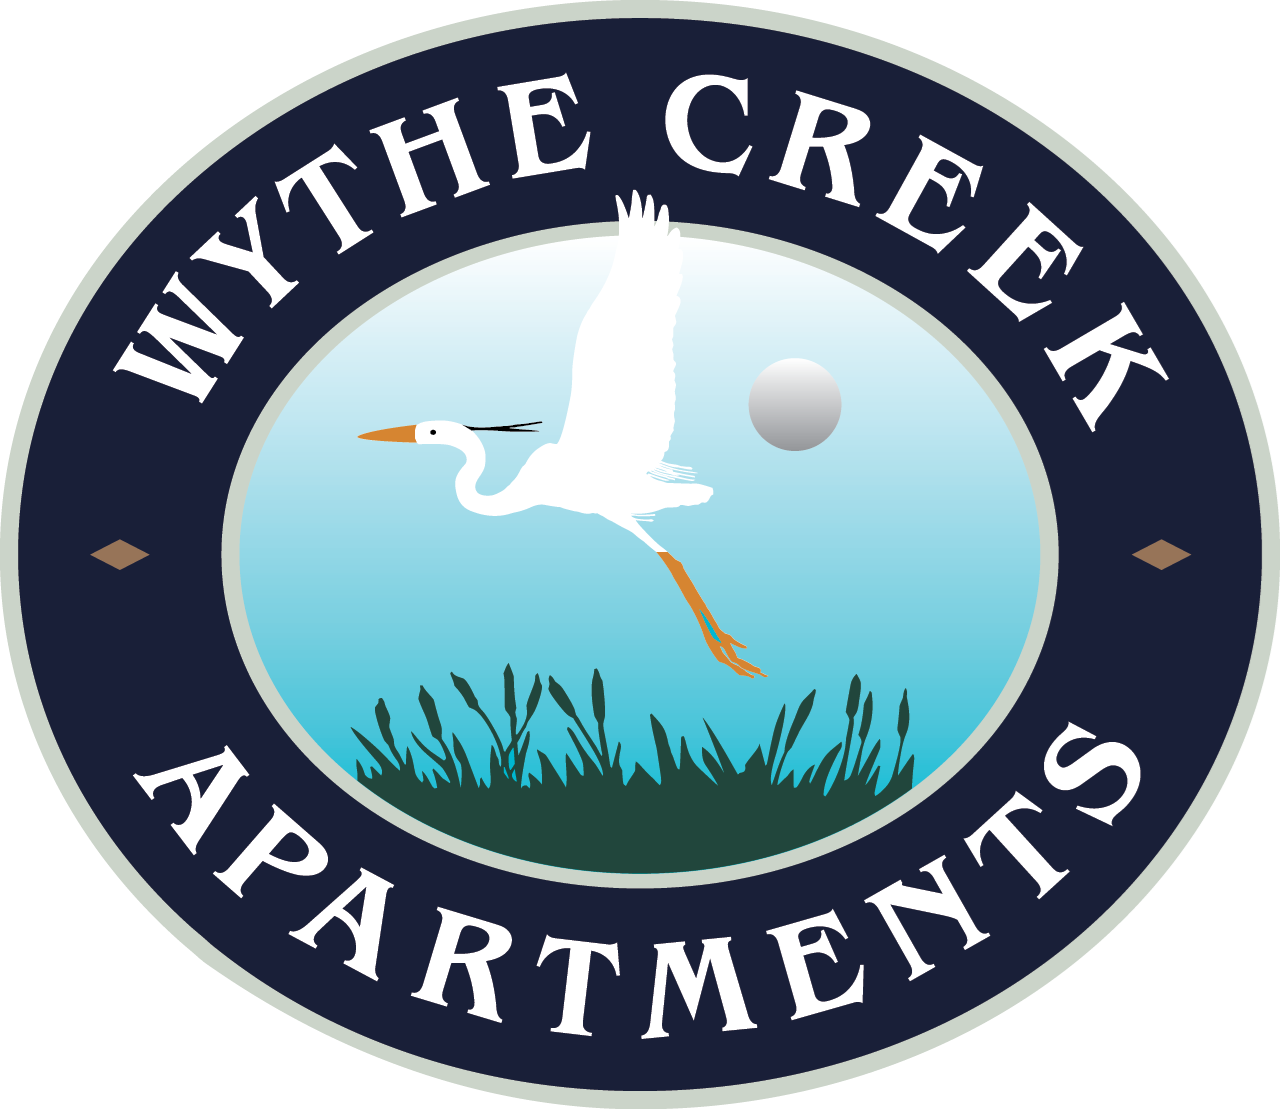 Wythe Creek apartments for rent in Poquoson VA